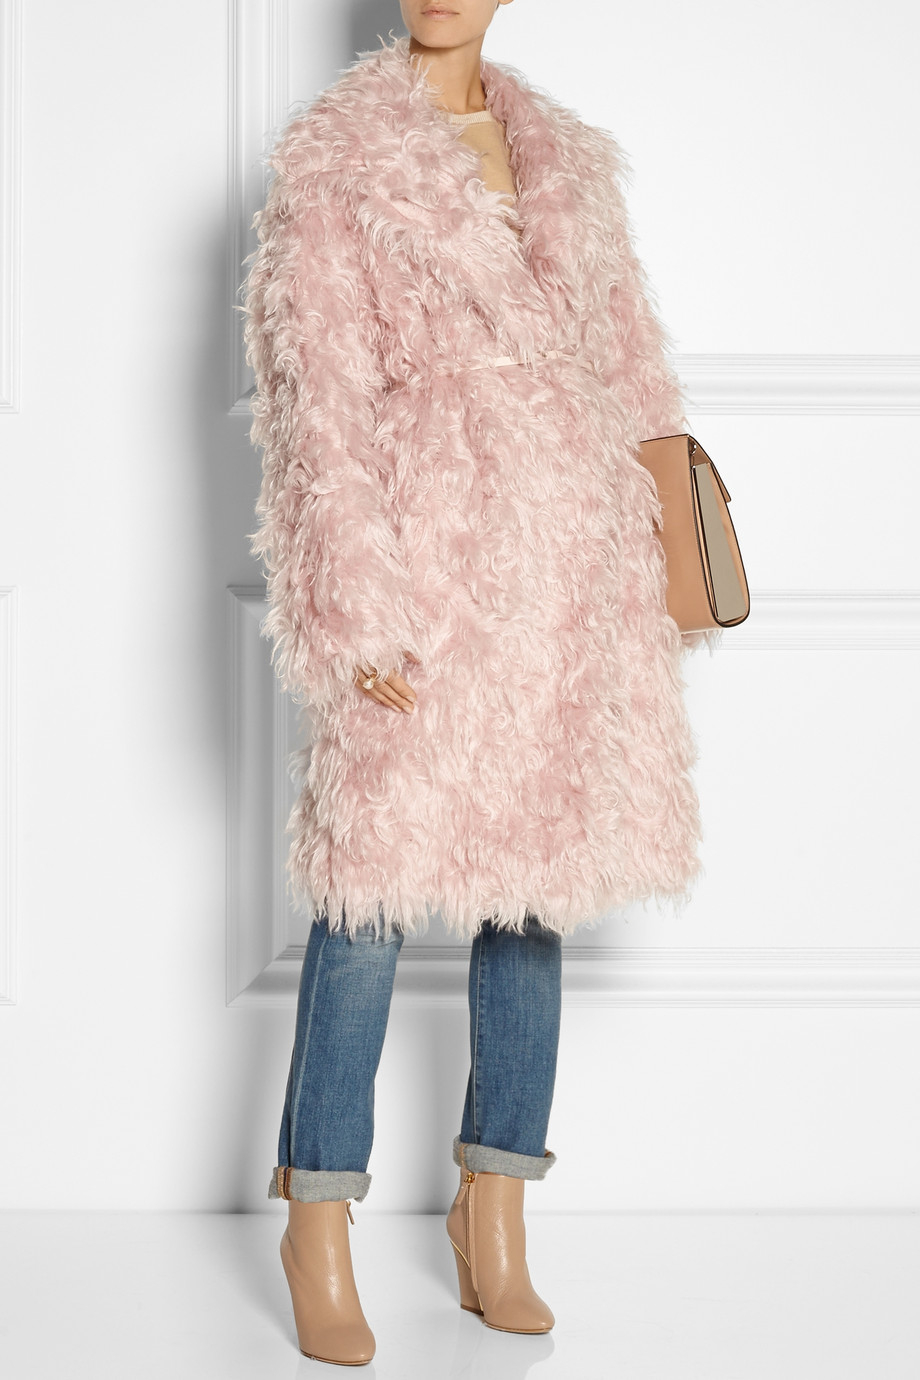 N°21 Casire Oversized Mohair-Blend Faux Shearling Coat in Pink | Lyst